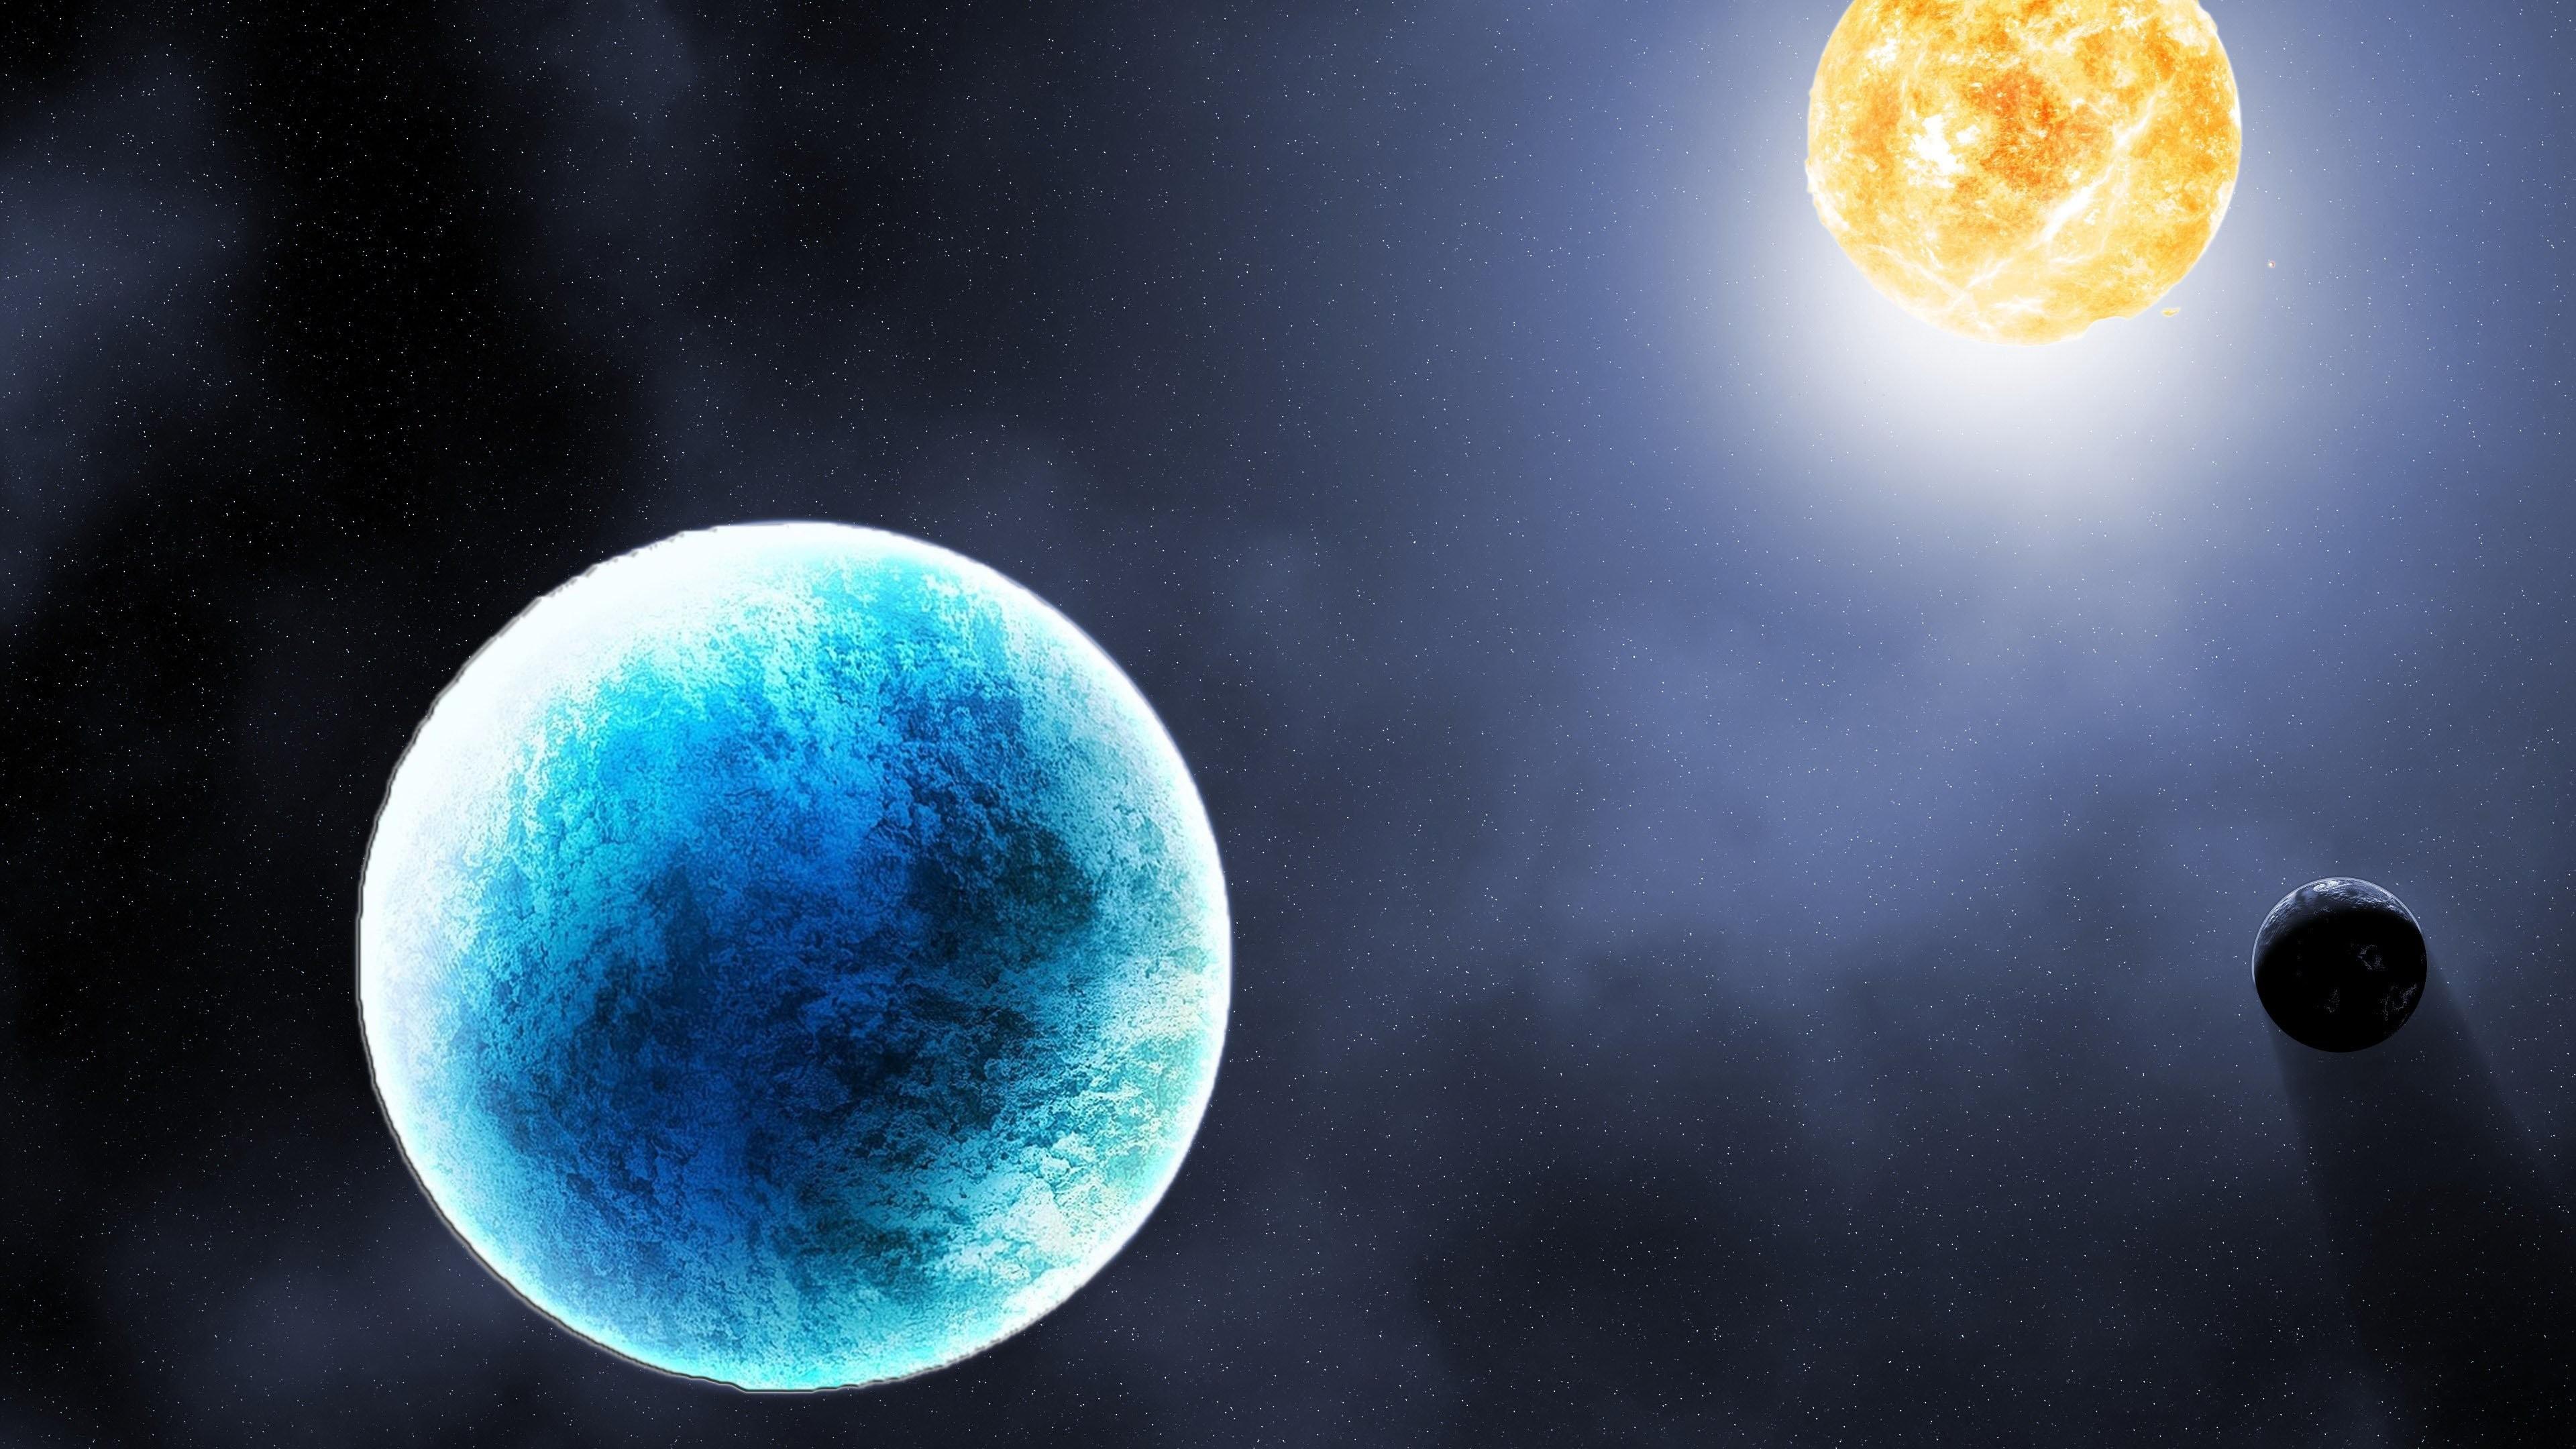 Scientific planet galaxy space stars ultrahd 4k Best wallpaper  wallpaper | | 995750 | WallpaperUP